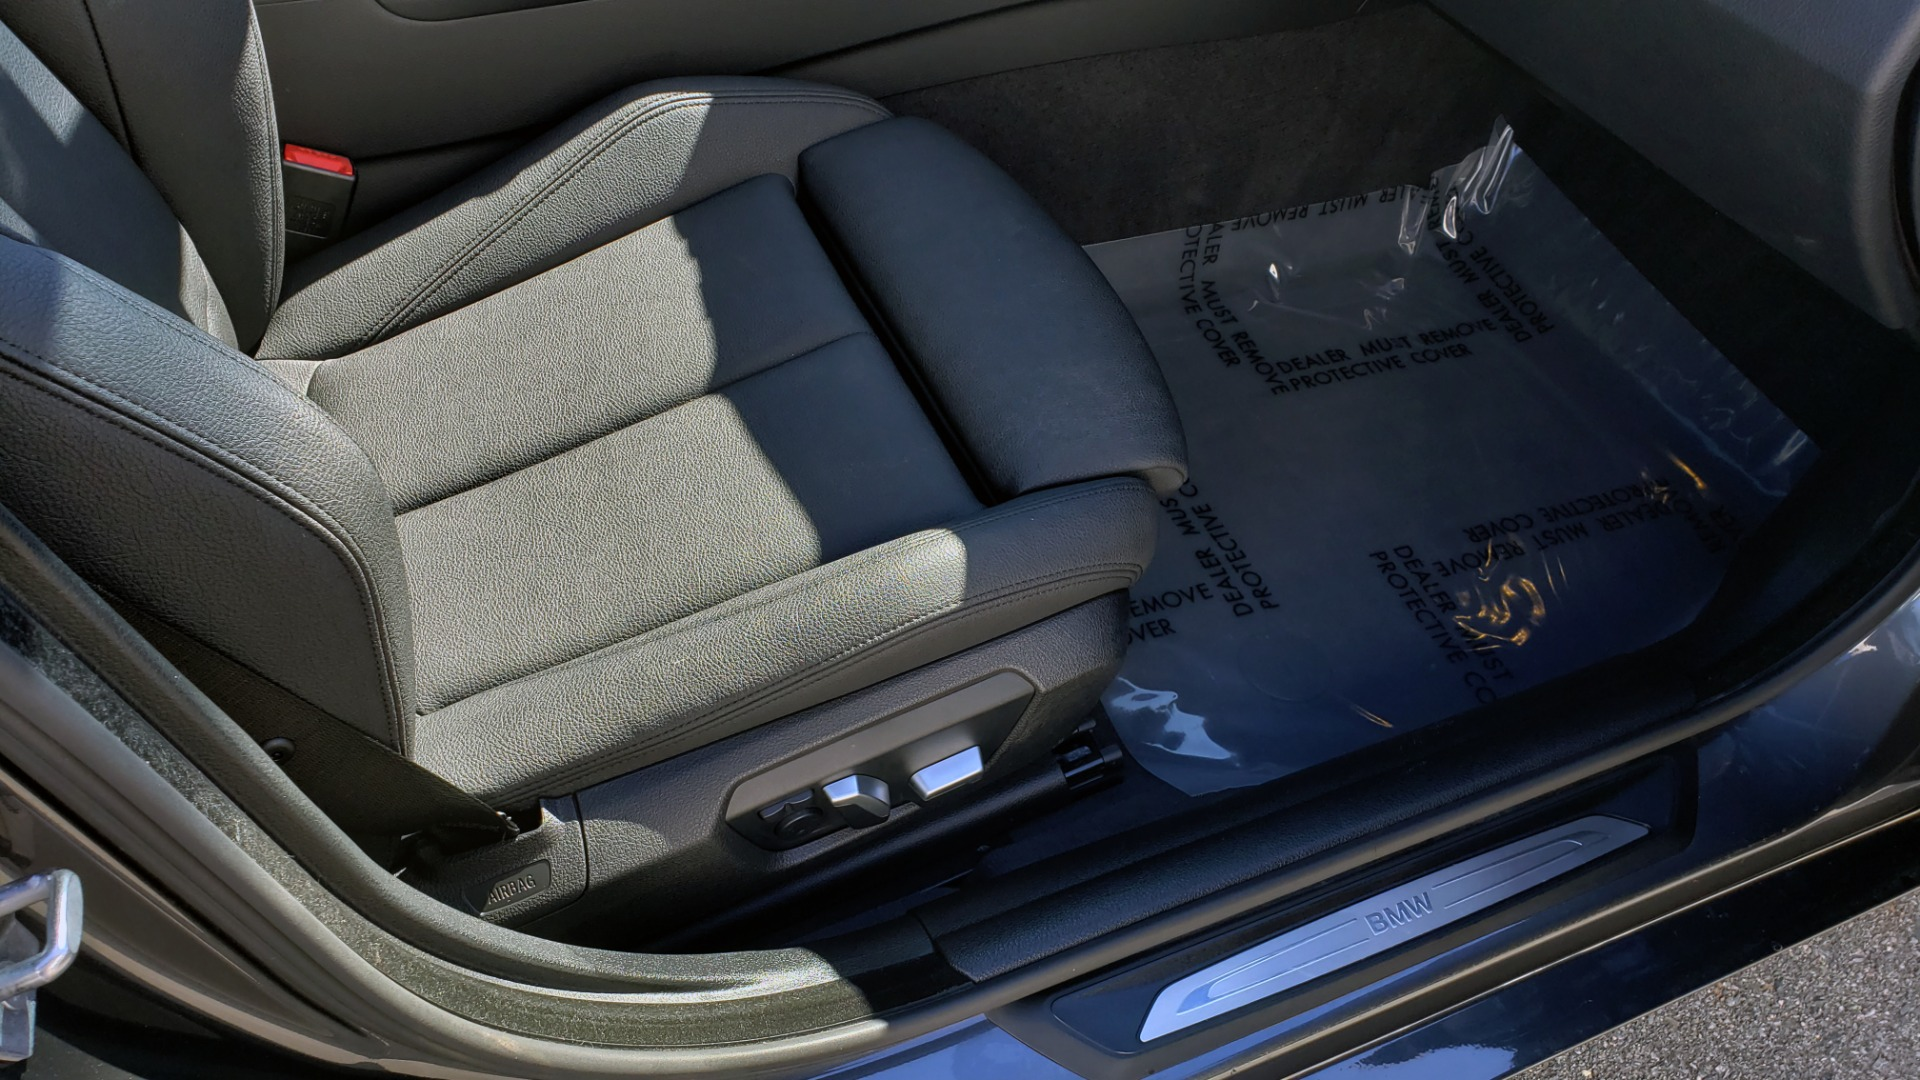 Used 2018 BMW 4 SERIES 430IXDRIVE / PREMIUM / NAV / SUNROOF / ESSENTIALS PKG for sale $29,495 at Formula Imports in Charlotte NC 28227 64